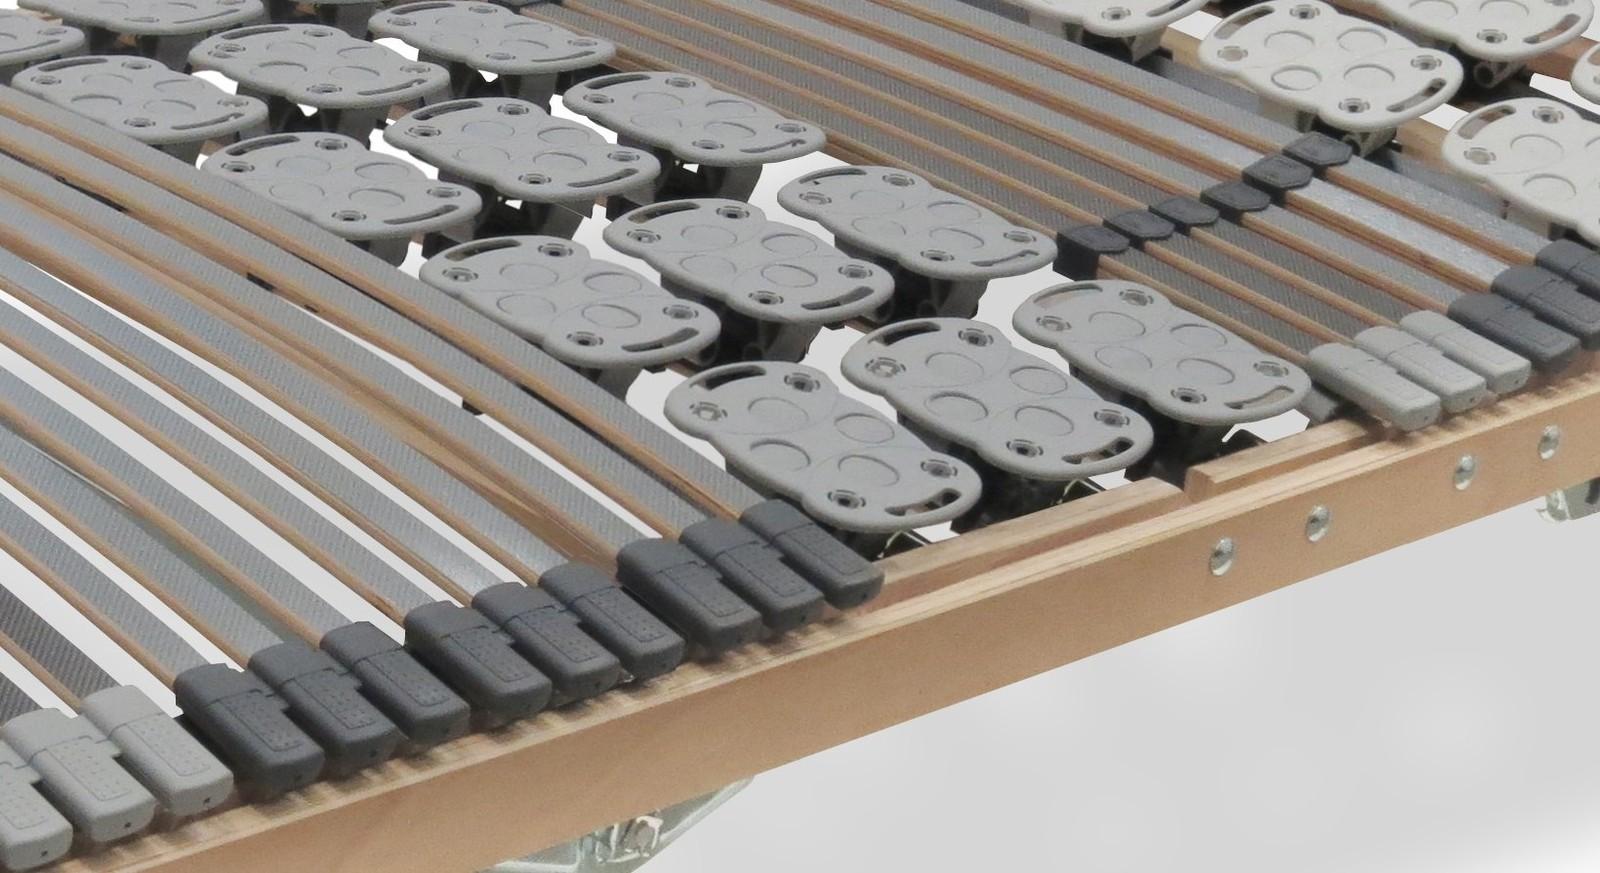 Lattenrost orthowell kombiflex motor mit flexiblen Tellermodulen